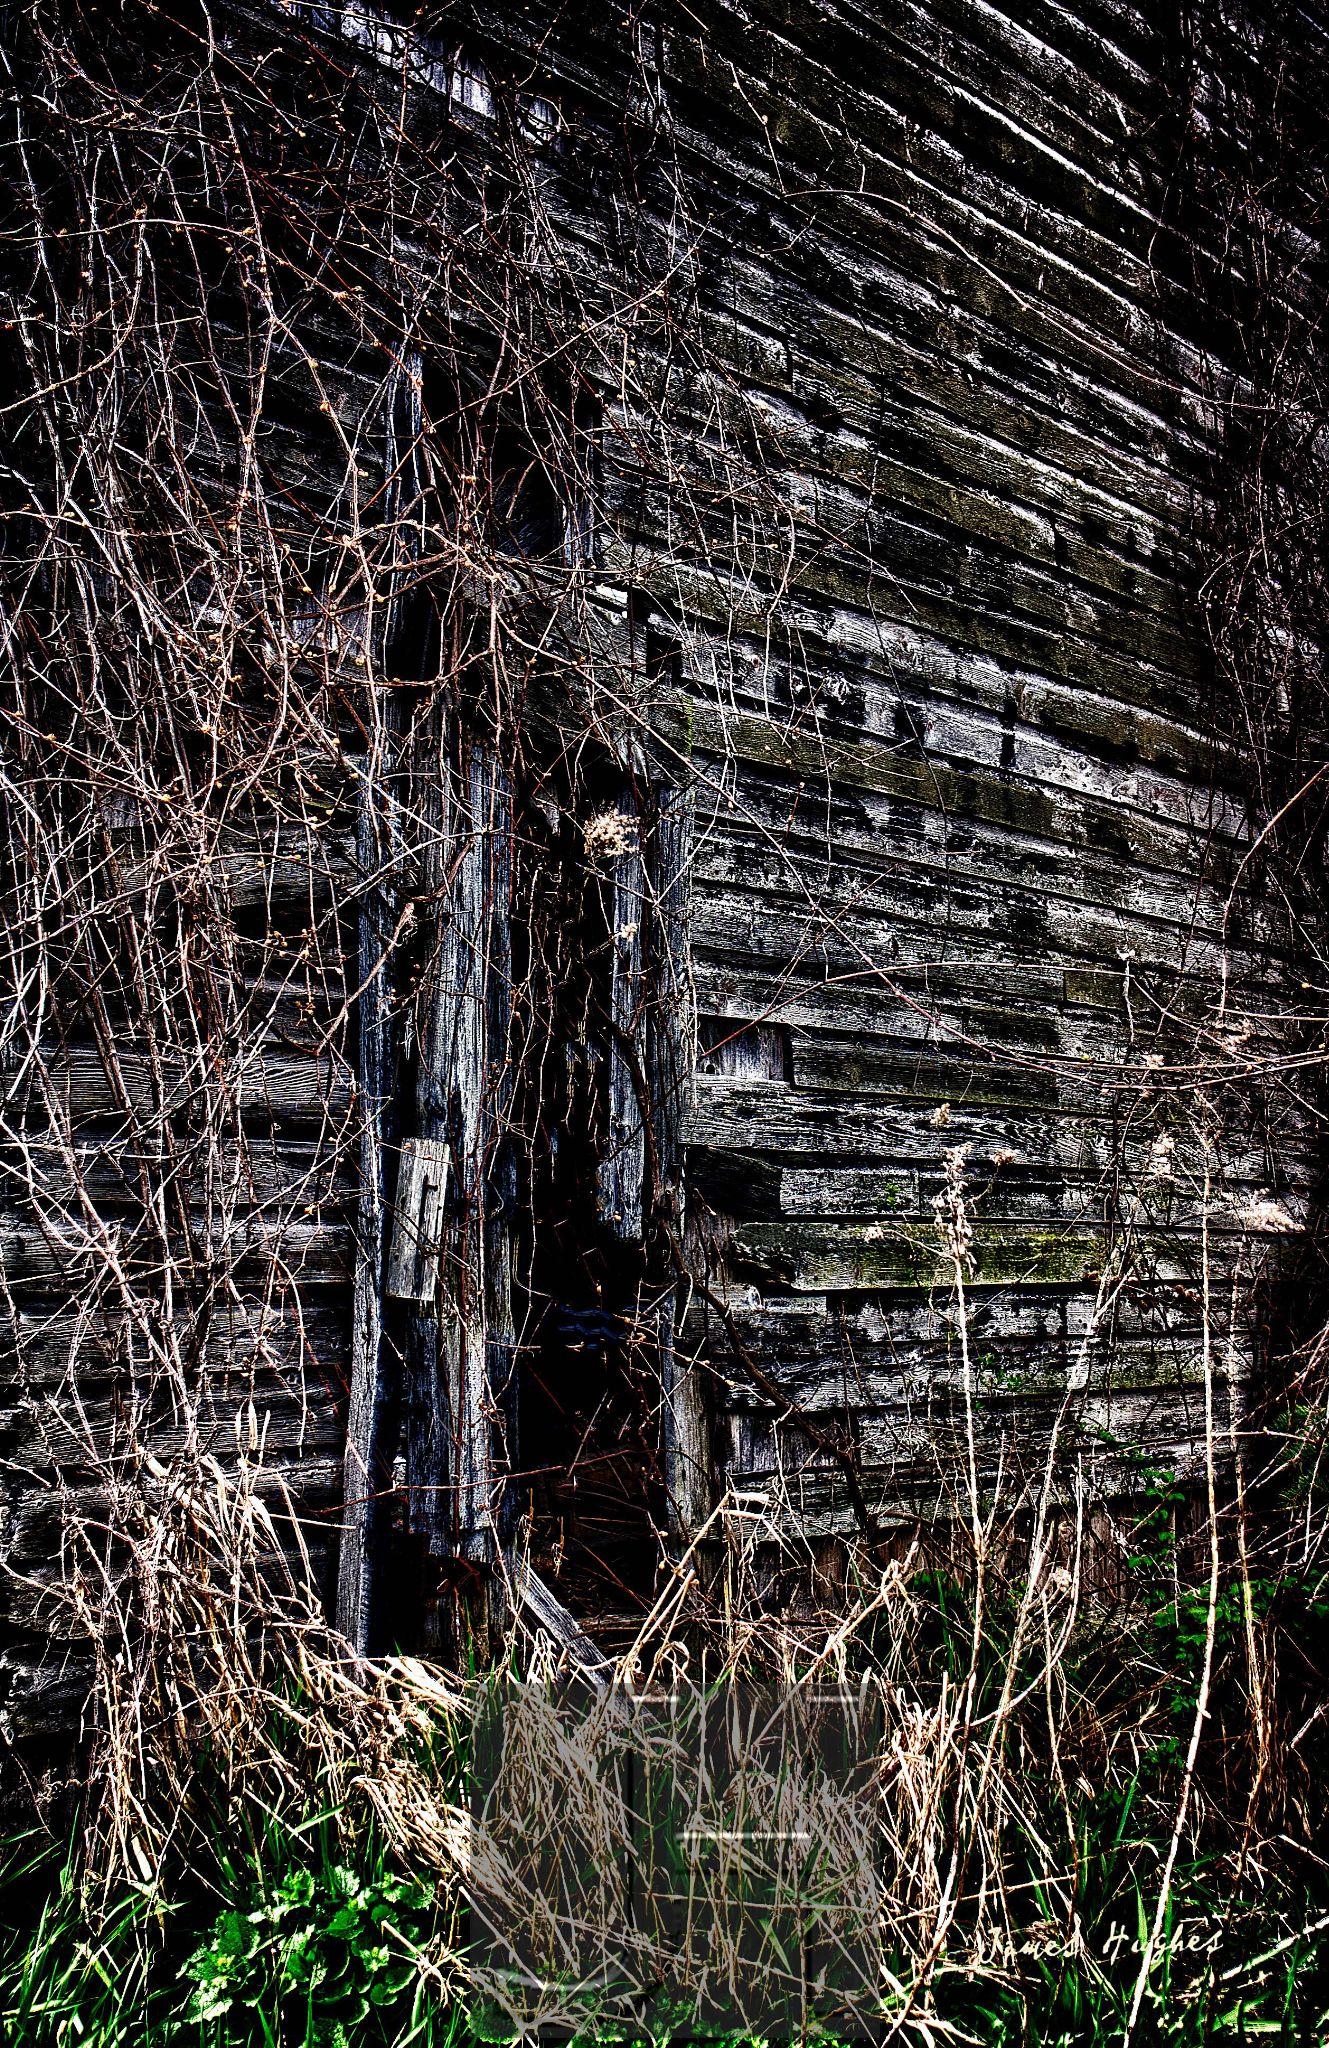 Barn Door by James Hughes Photography